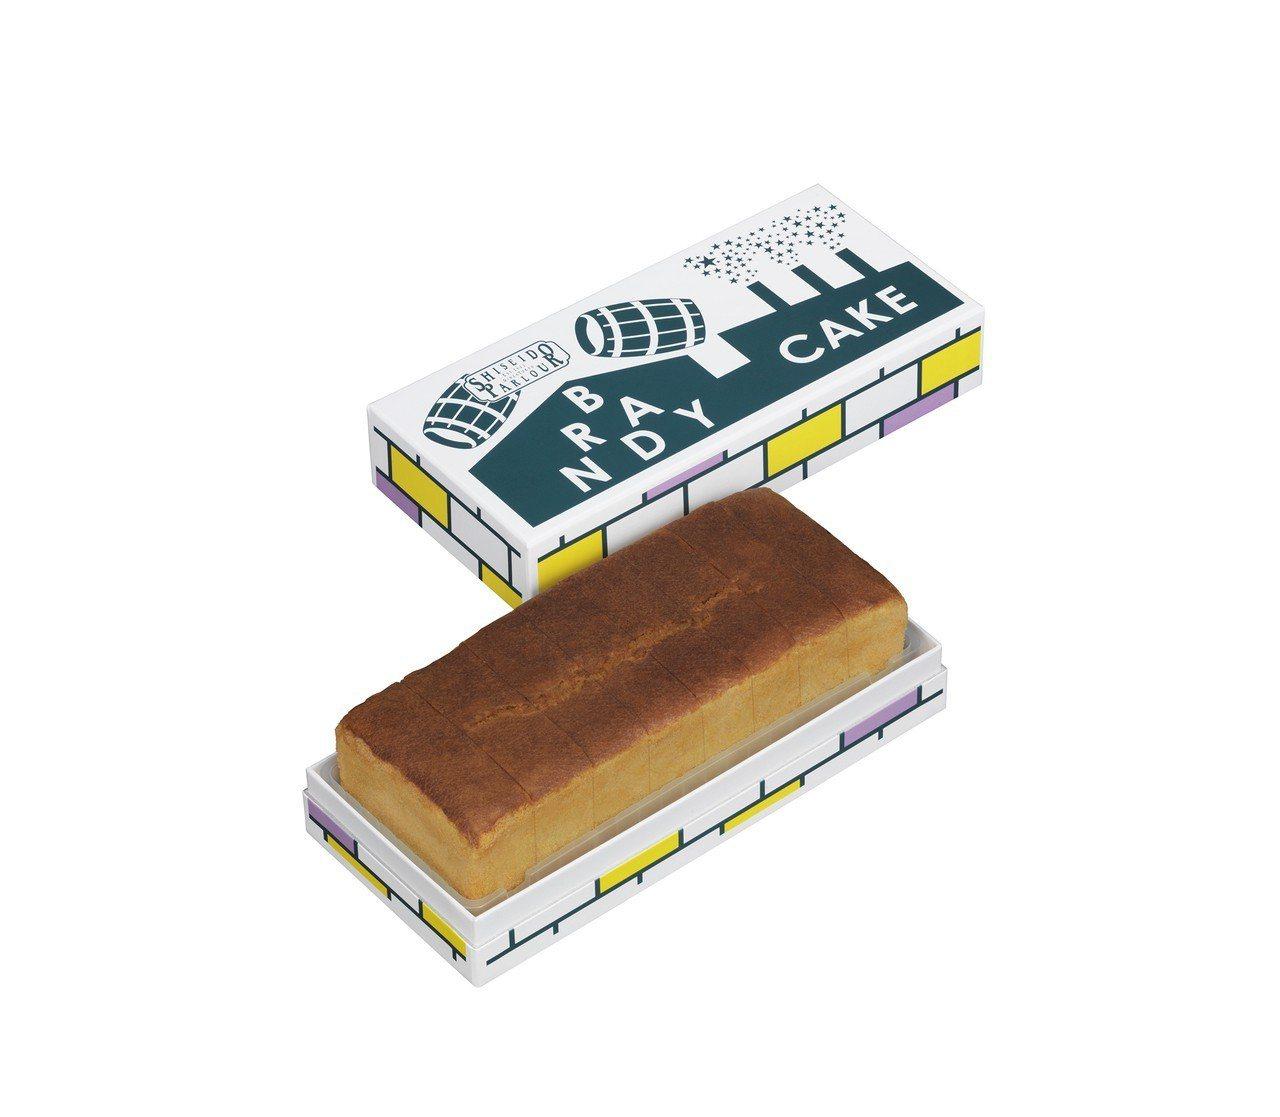 SHISEIDO PARLOUR白蘭地蛋糕約1,045元。圖/SOGO提供